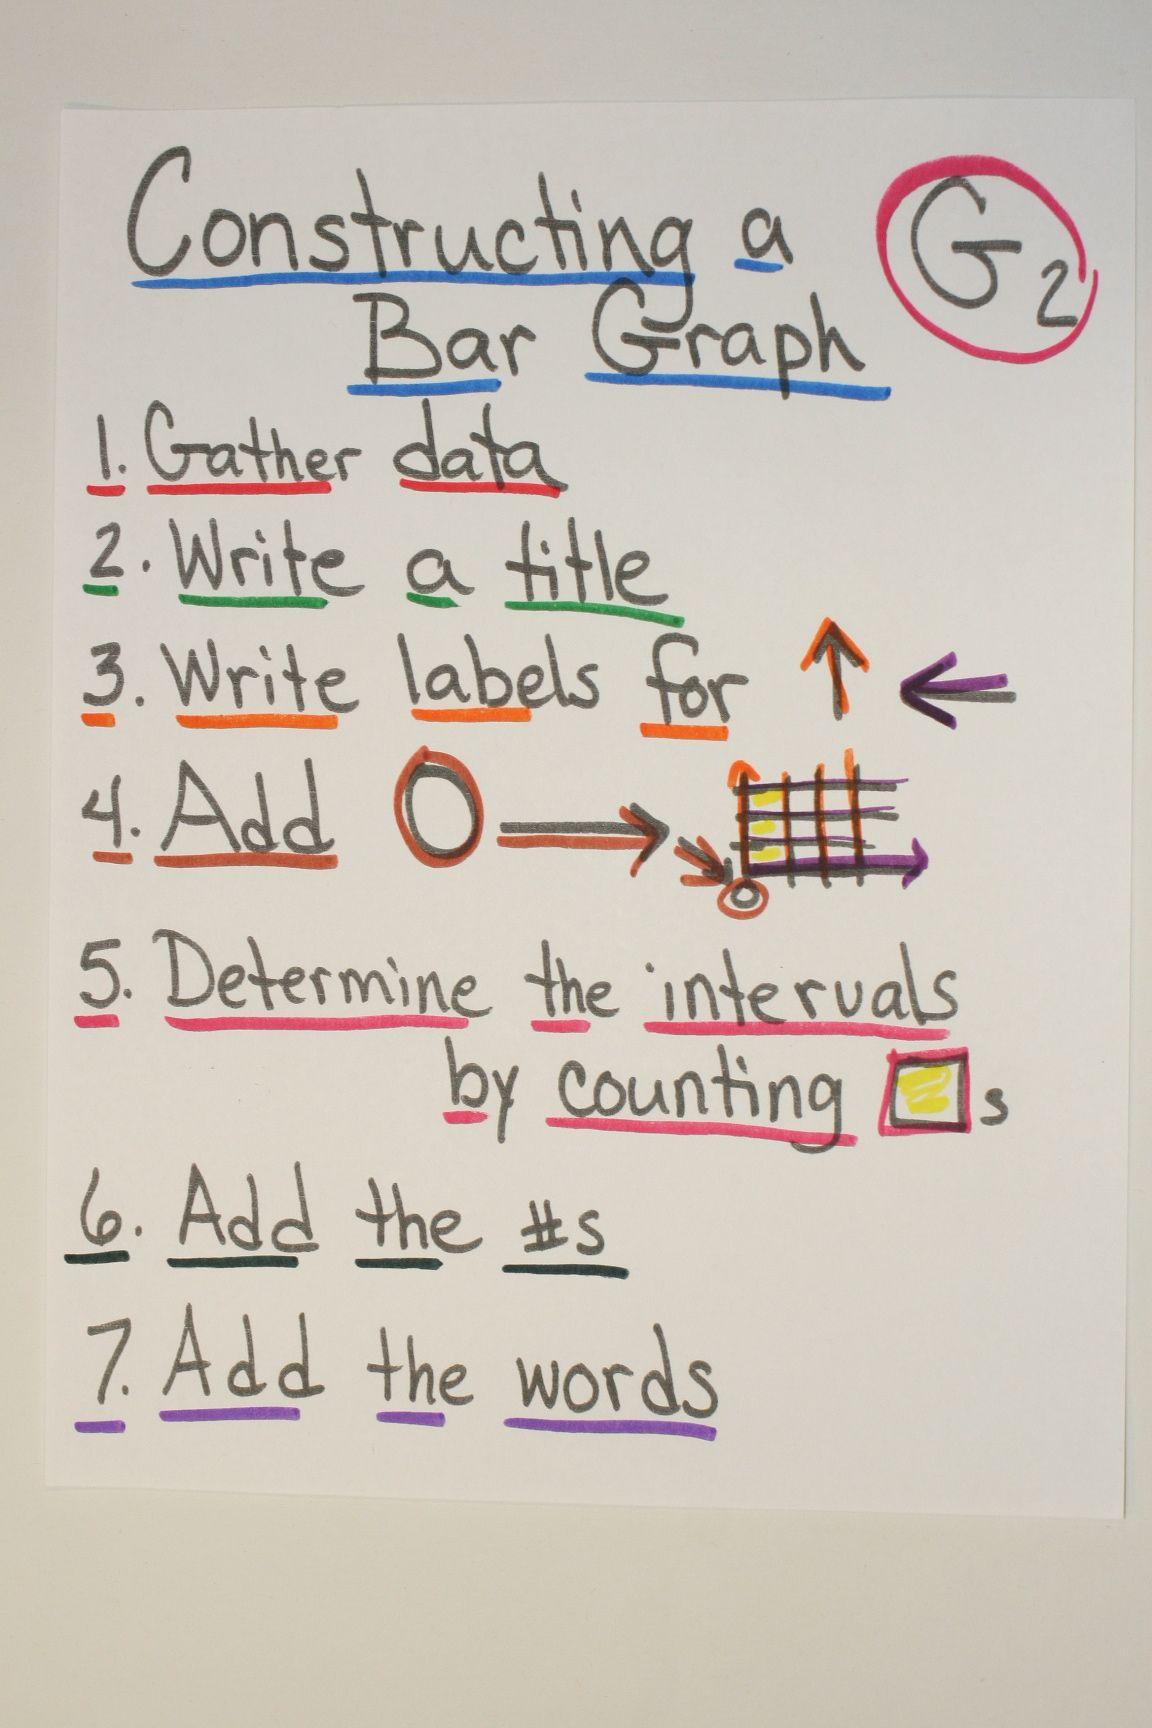 medium resolution of 30 Bar Graphs ideas   bar graphs